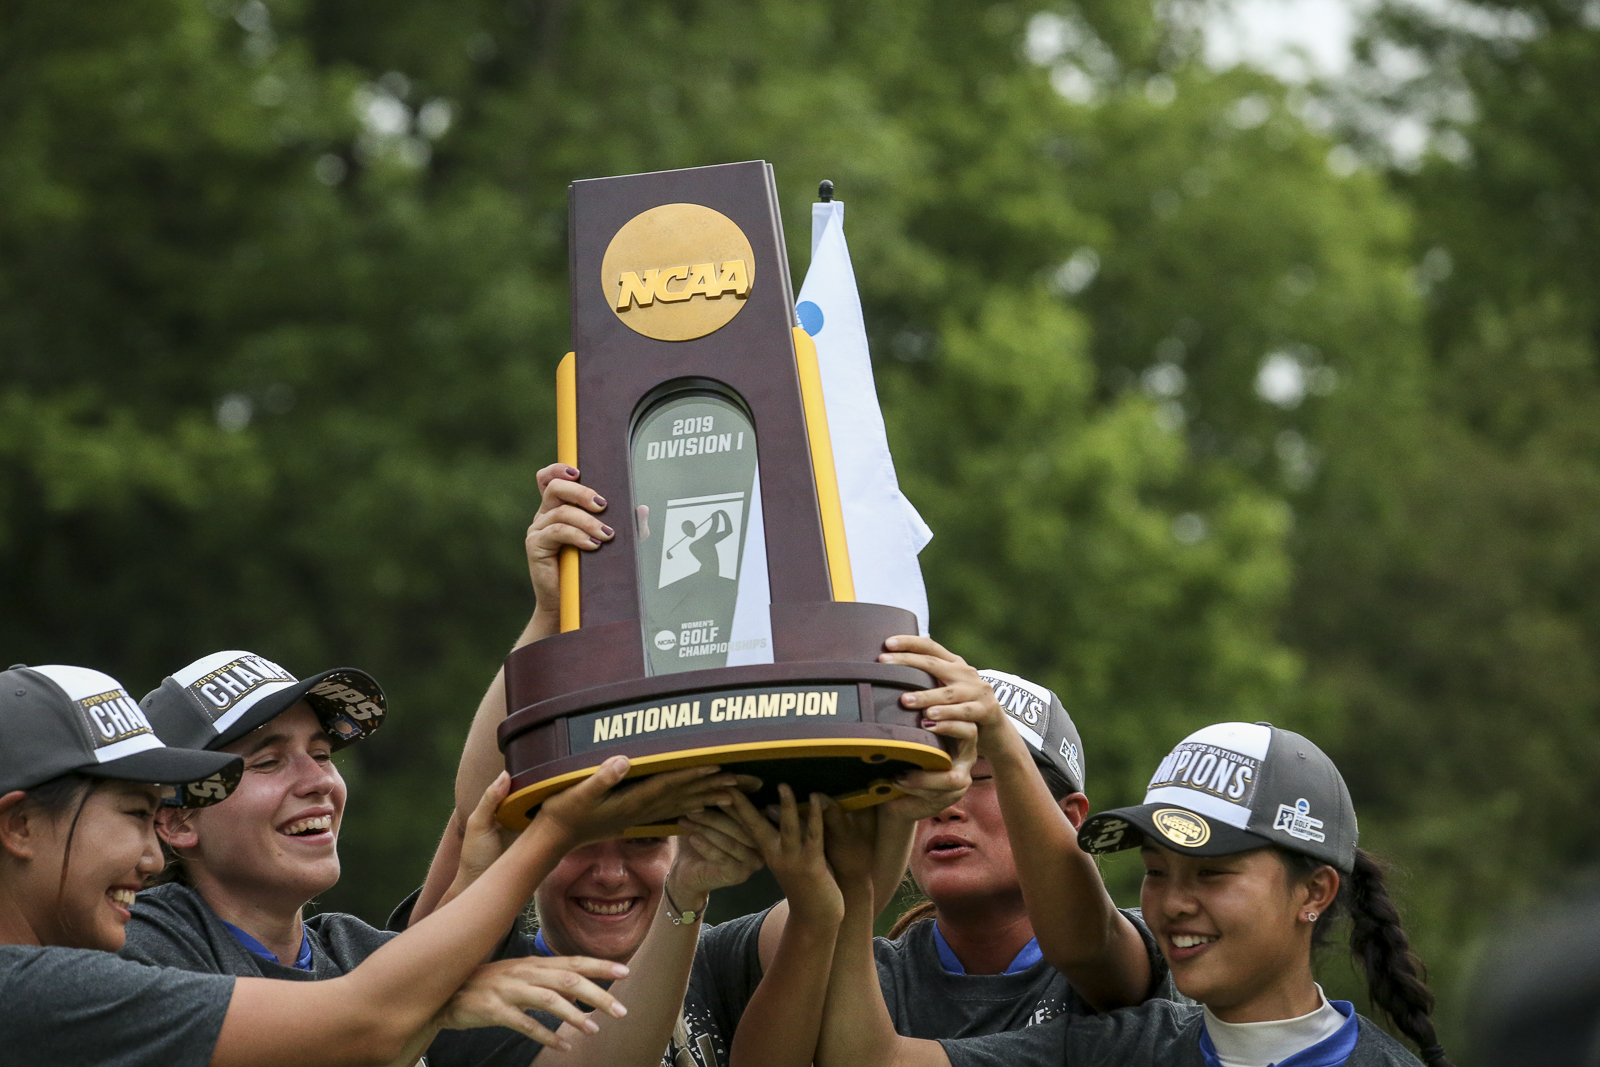 Duke Wins Women's NCAA Golf Championship At The Blessings